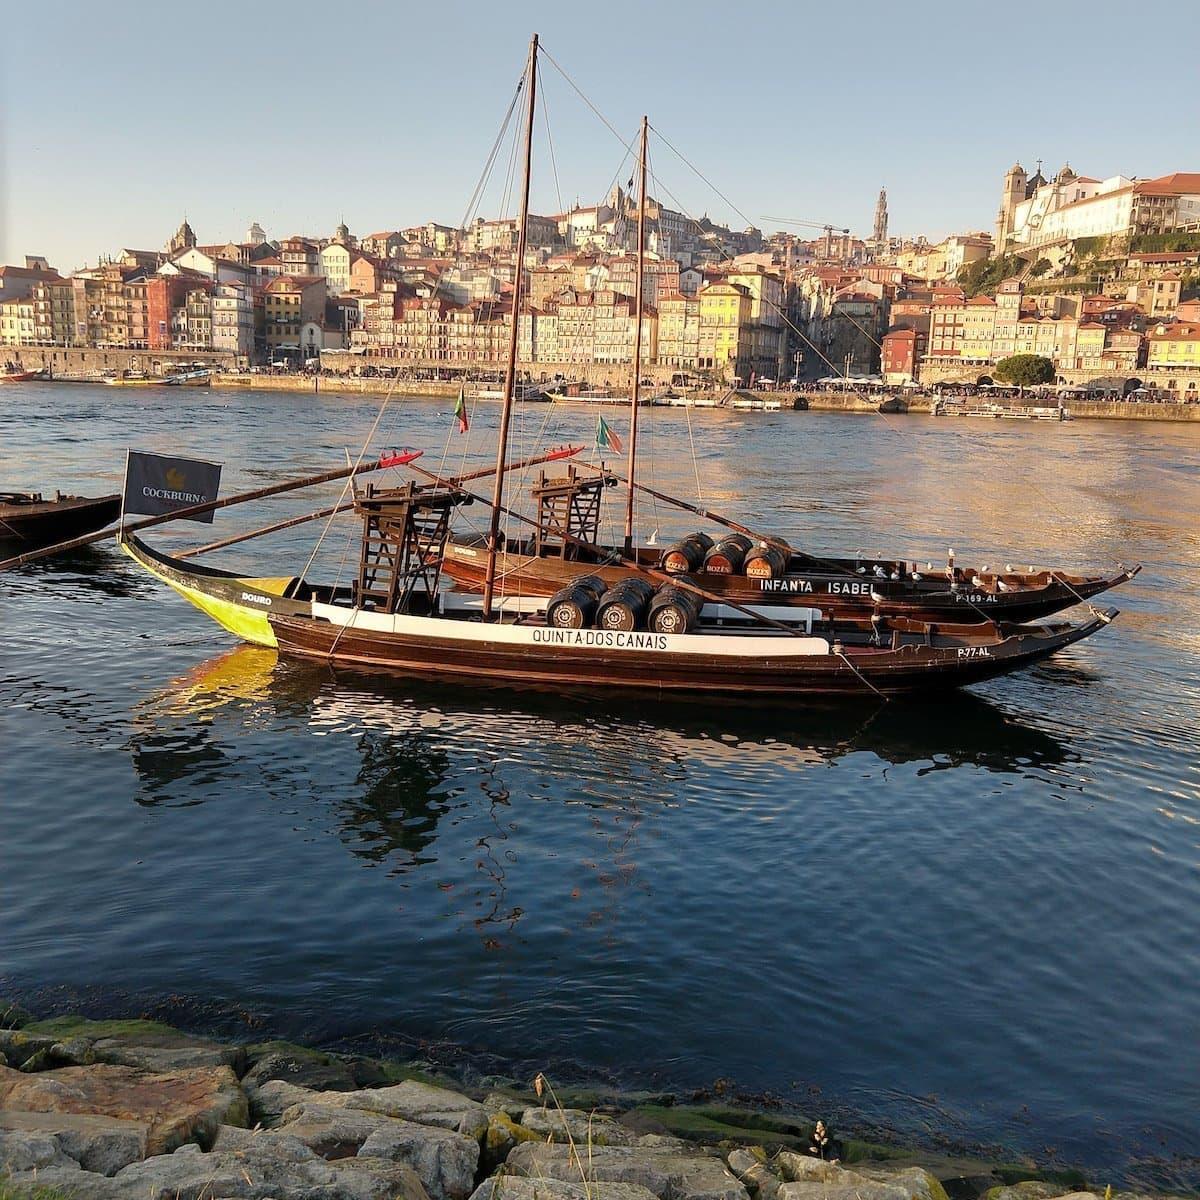 Port Wine Shipping Boat in Porto, Portugal 2019